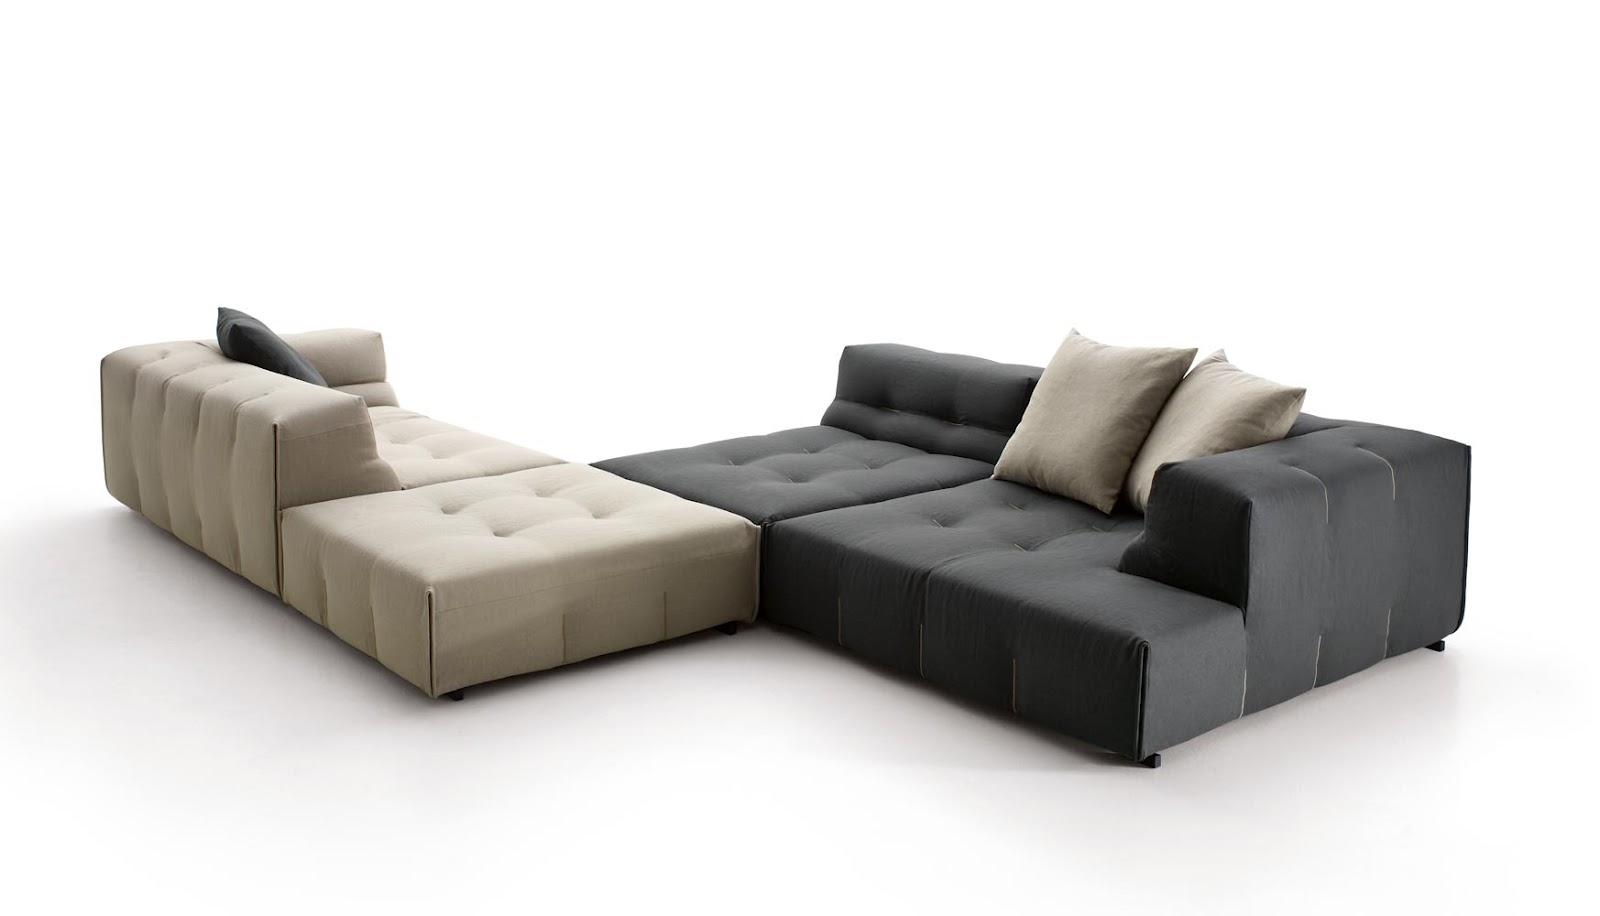 tufty too sofa by b b italia designer furniture fitted. Black Bedroom Furniture Sets. Home Design Ideas